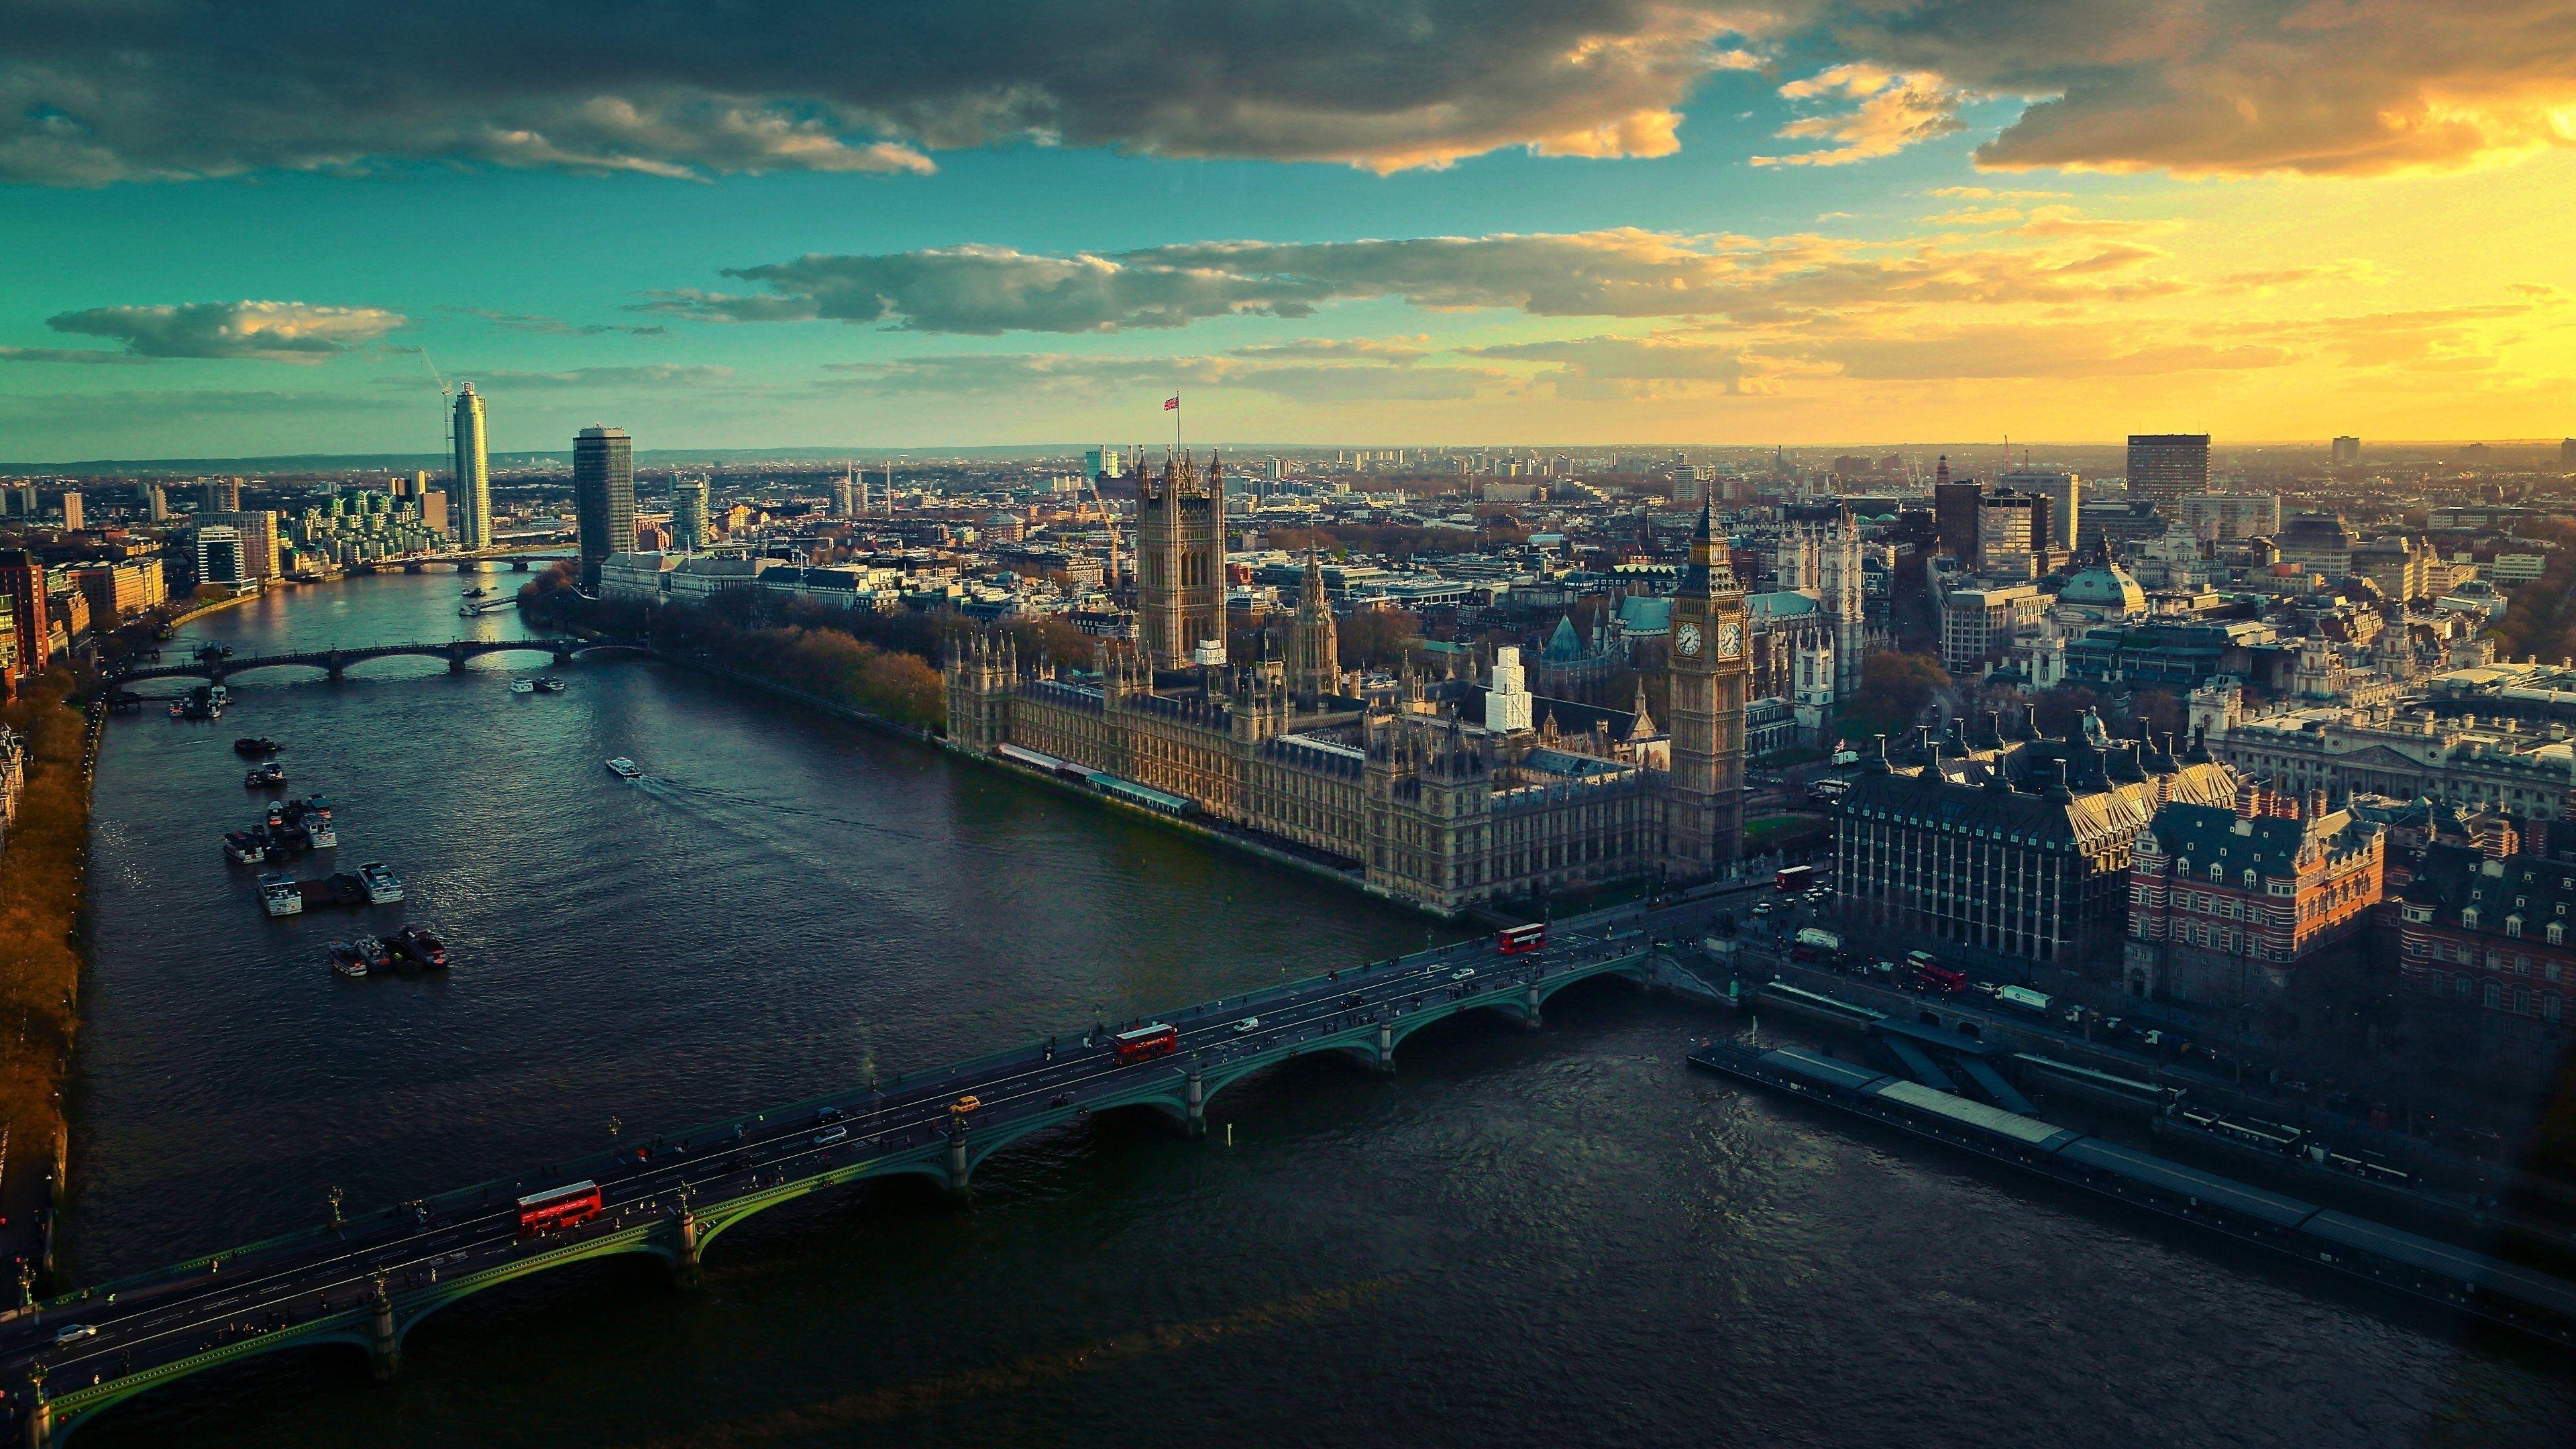 London Skyline Wallpapers Top Free London Skyline